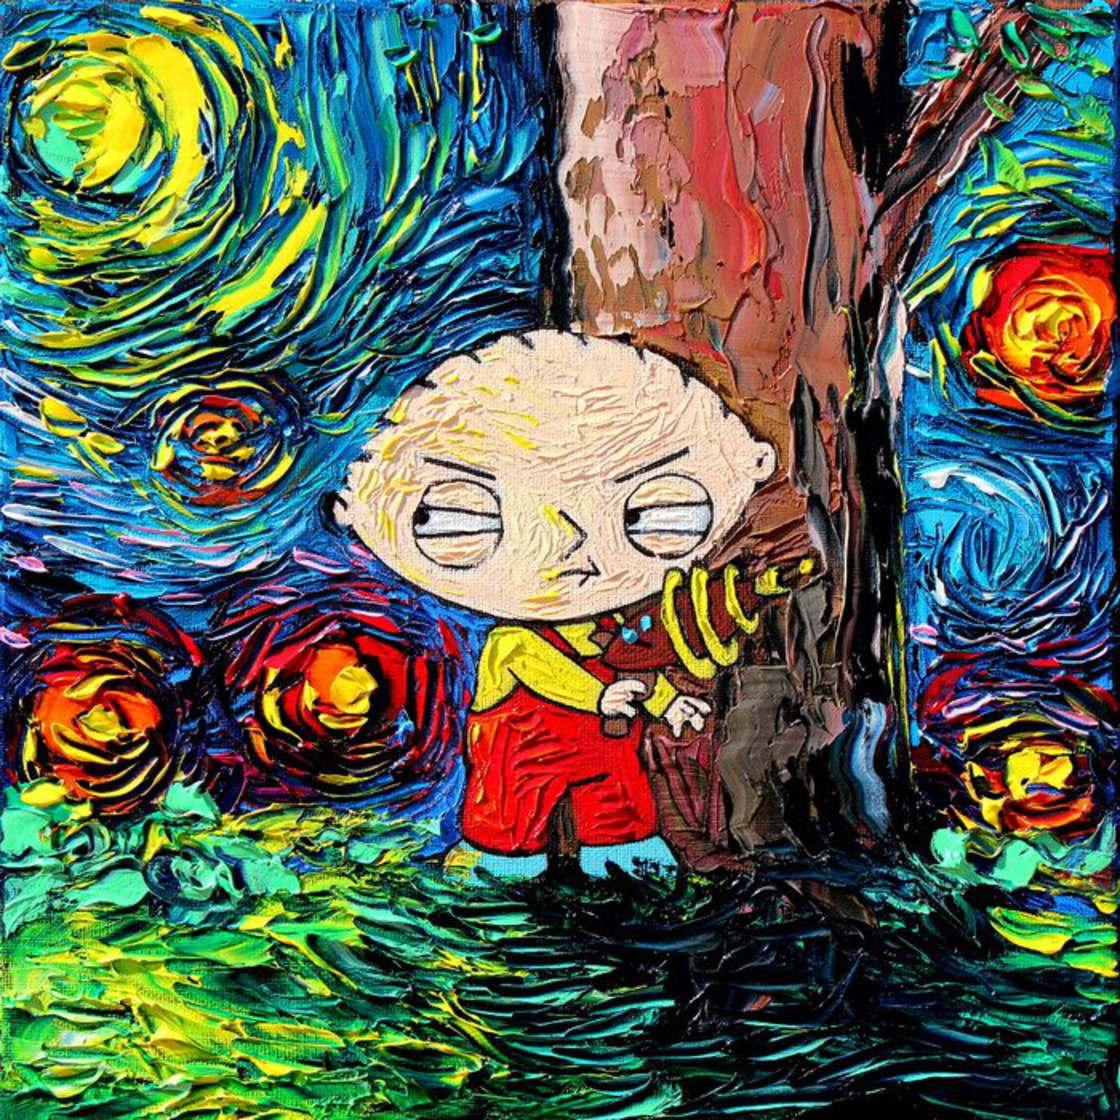 Starry Night - When Van Gogh meets Pop Culture